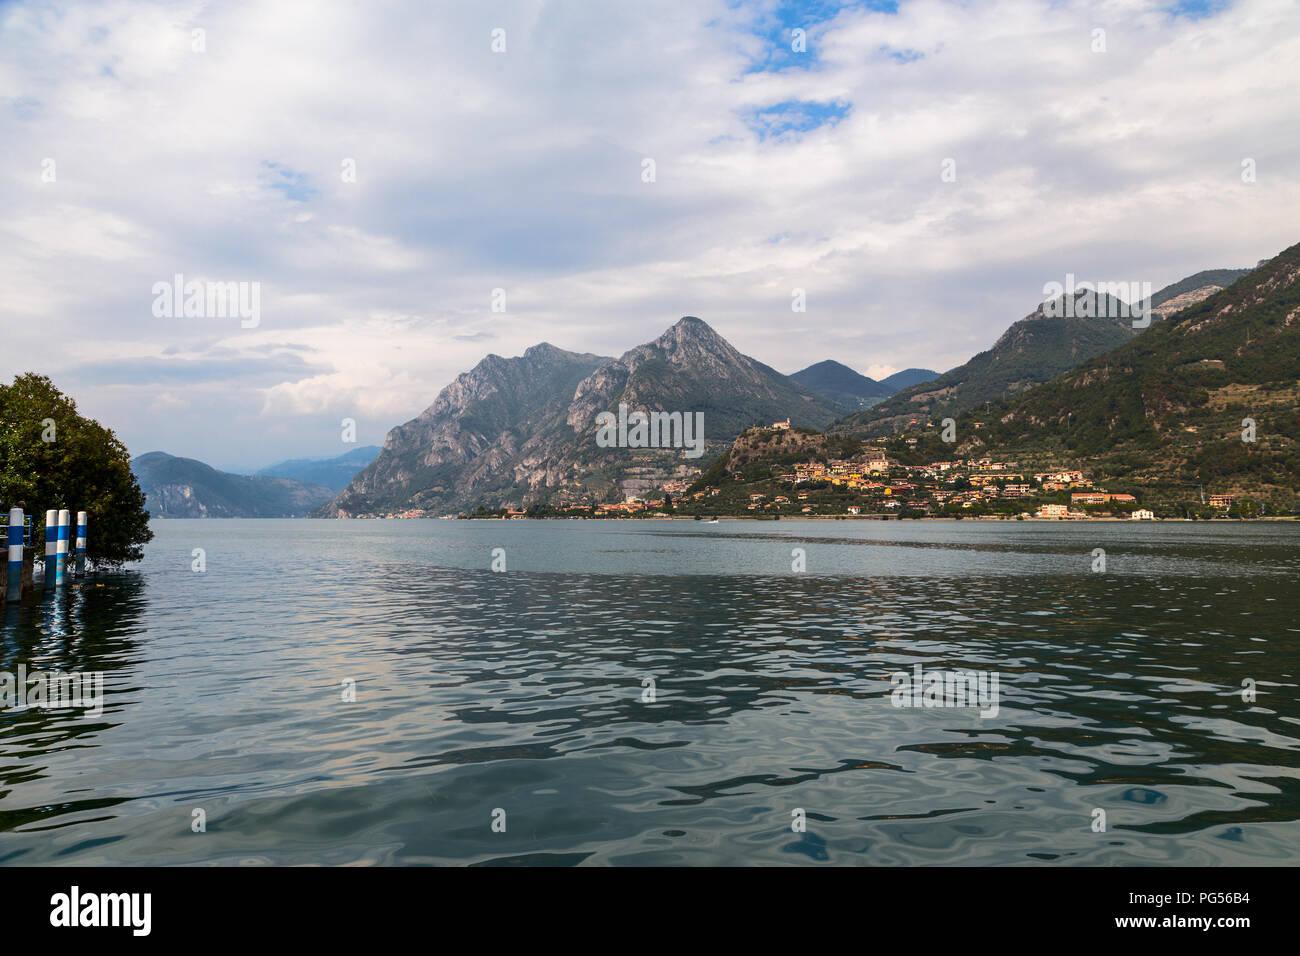 Lake Iseo and the surrounding mountain range. Italy - Stock Image